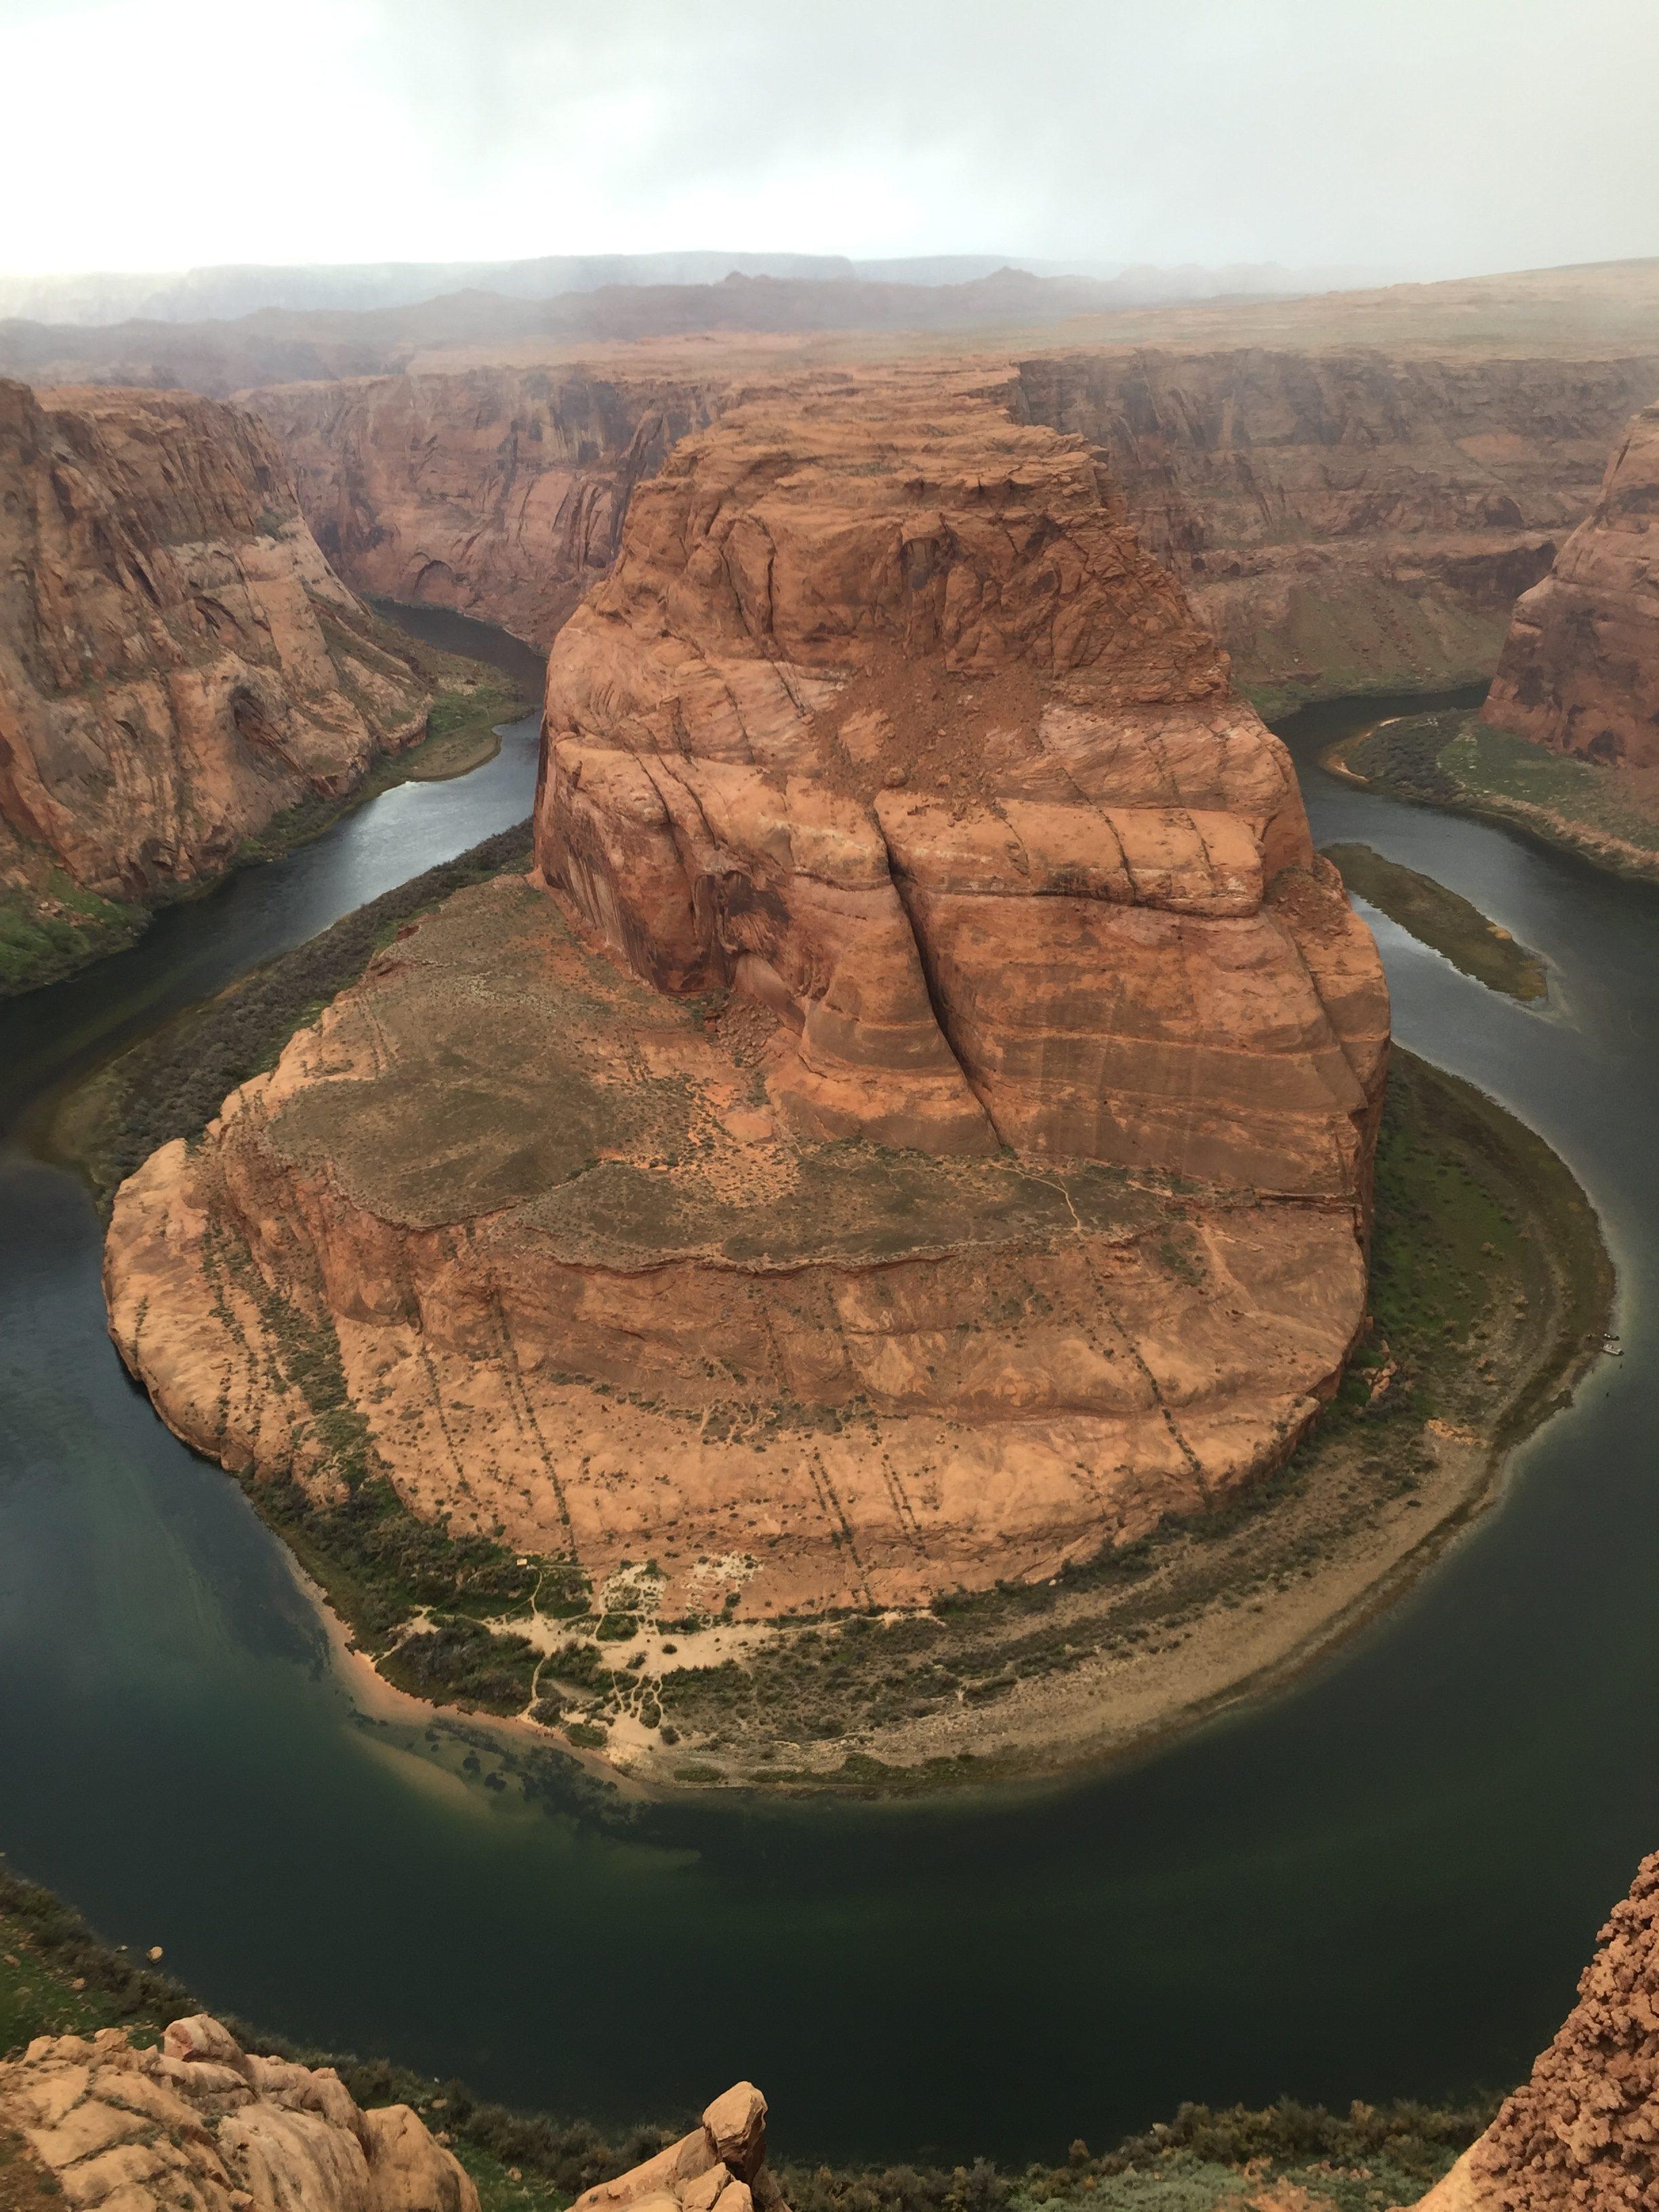 Horseshoe Bend south of Page, Arizona, Nov. 27, 2015  photo courtesy of Carolyn Barton, St. George News